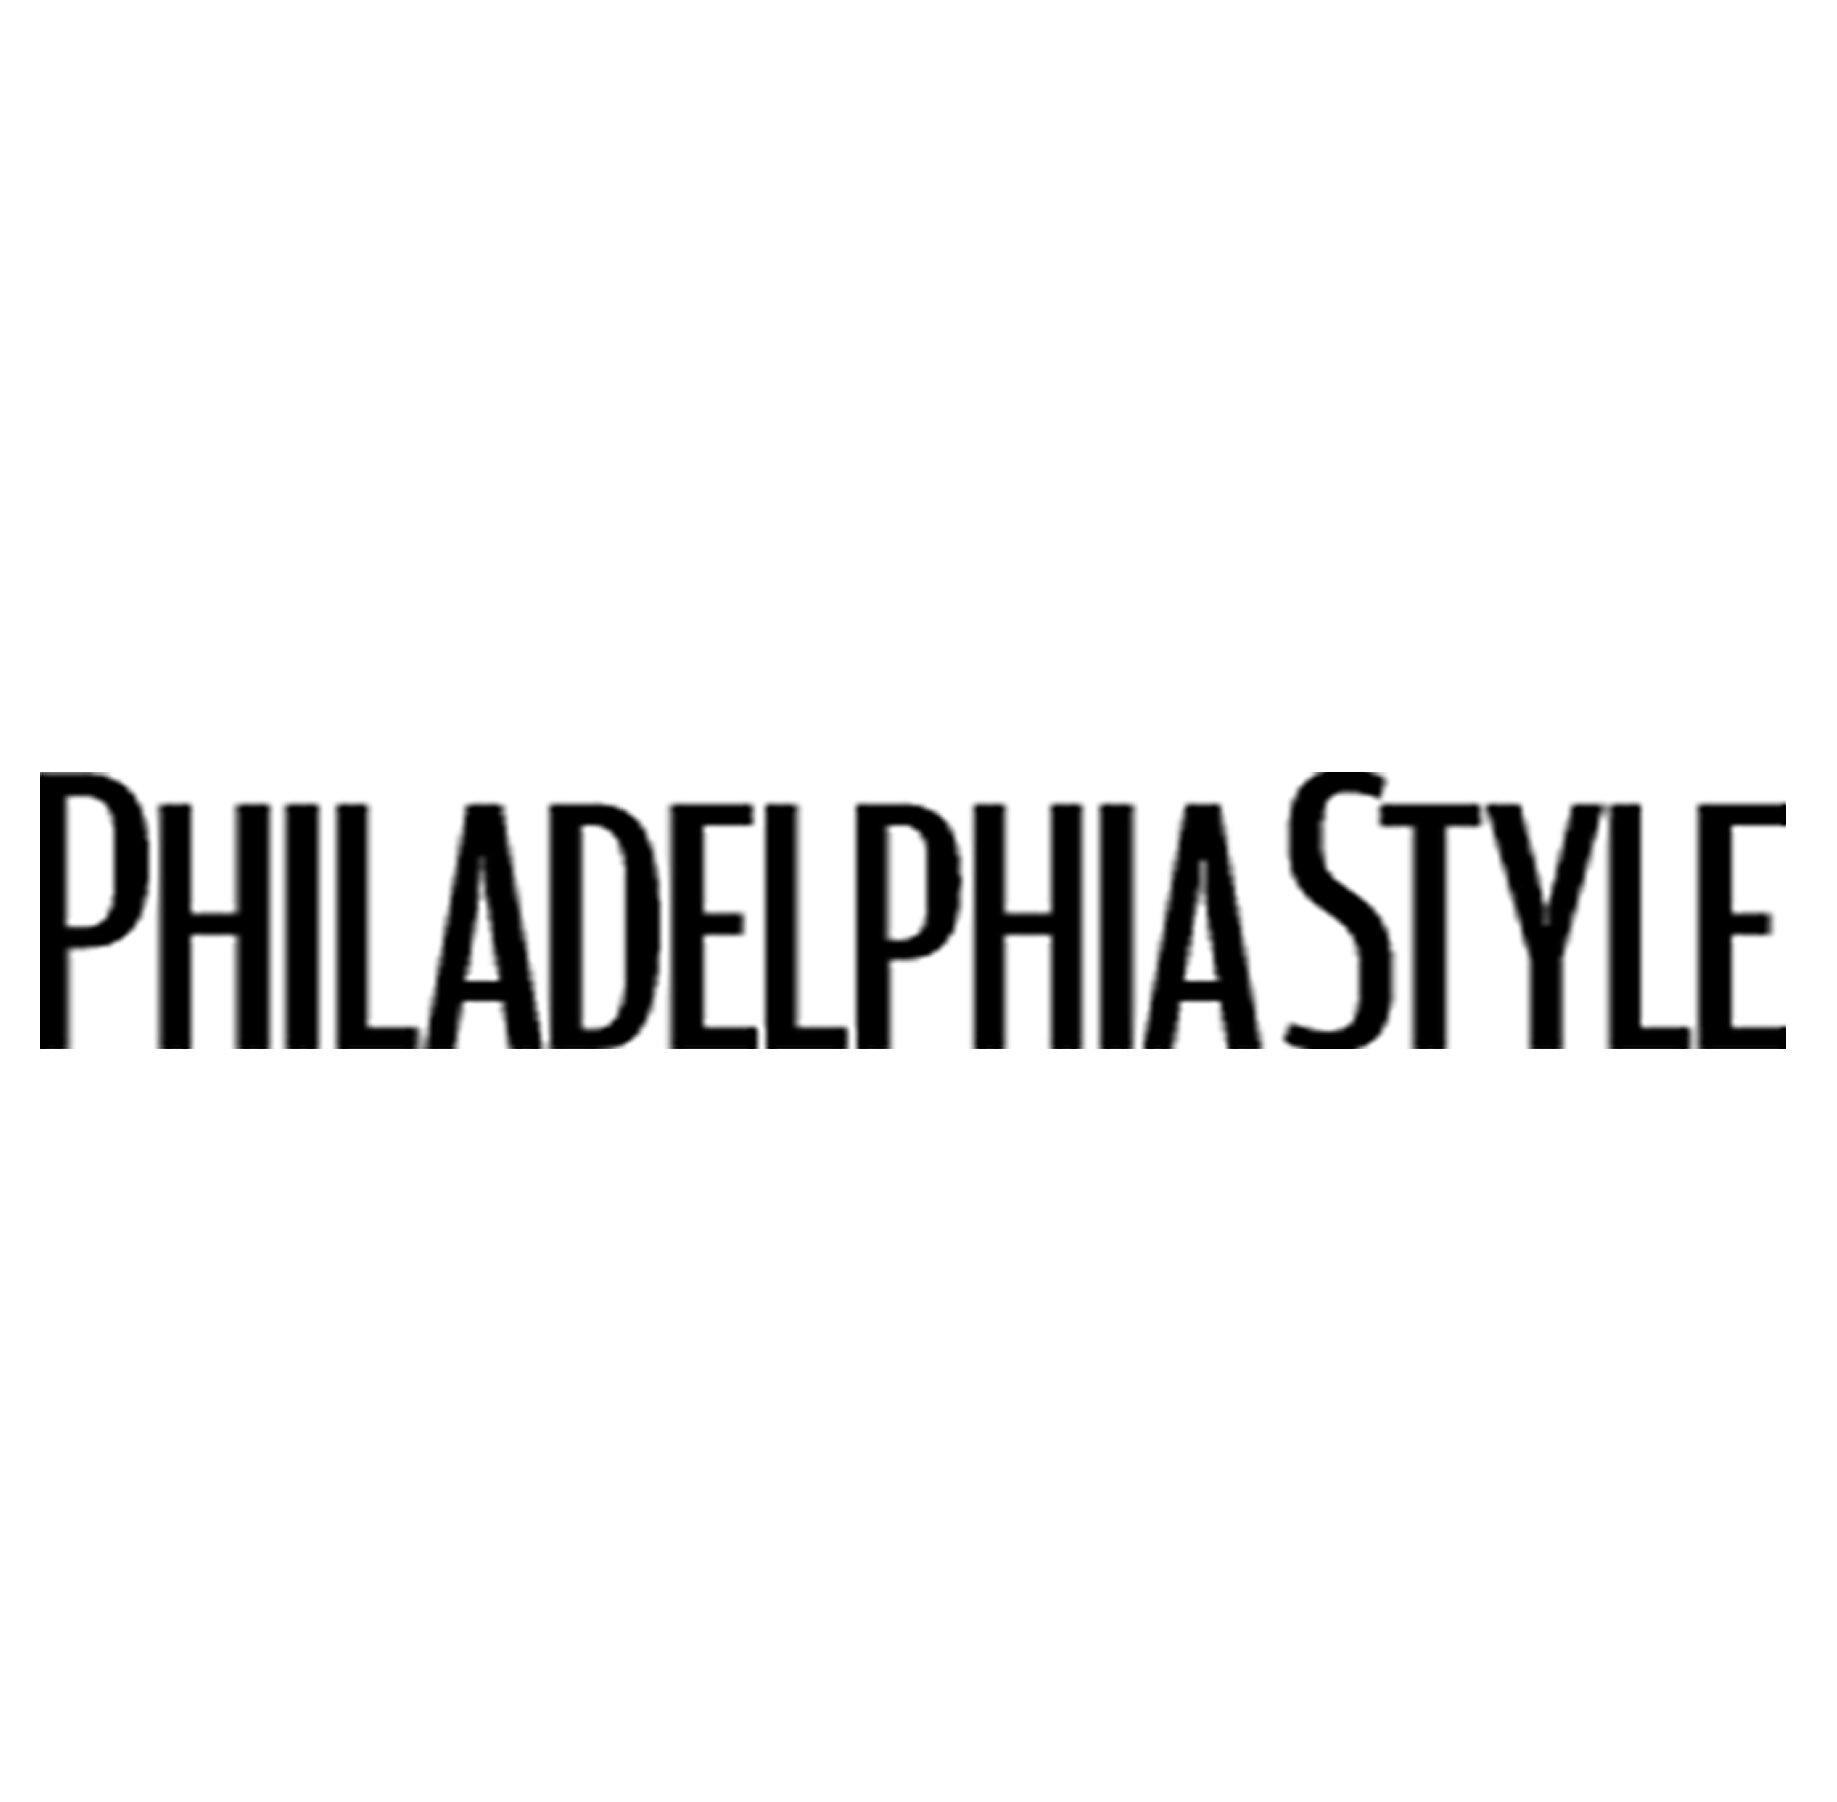 phillystyle.jpg